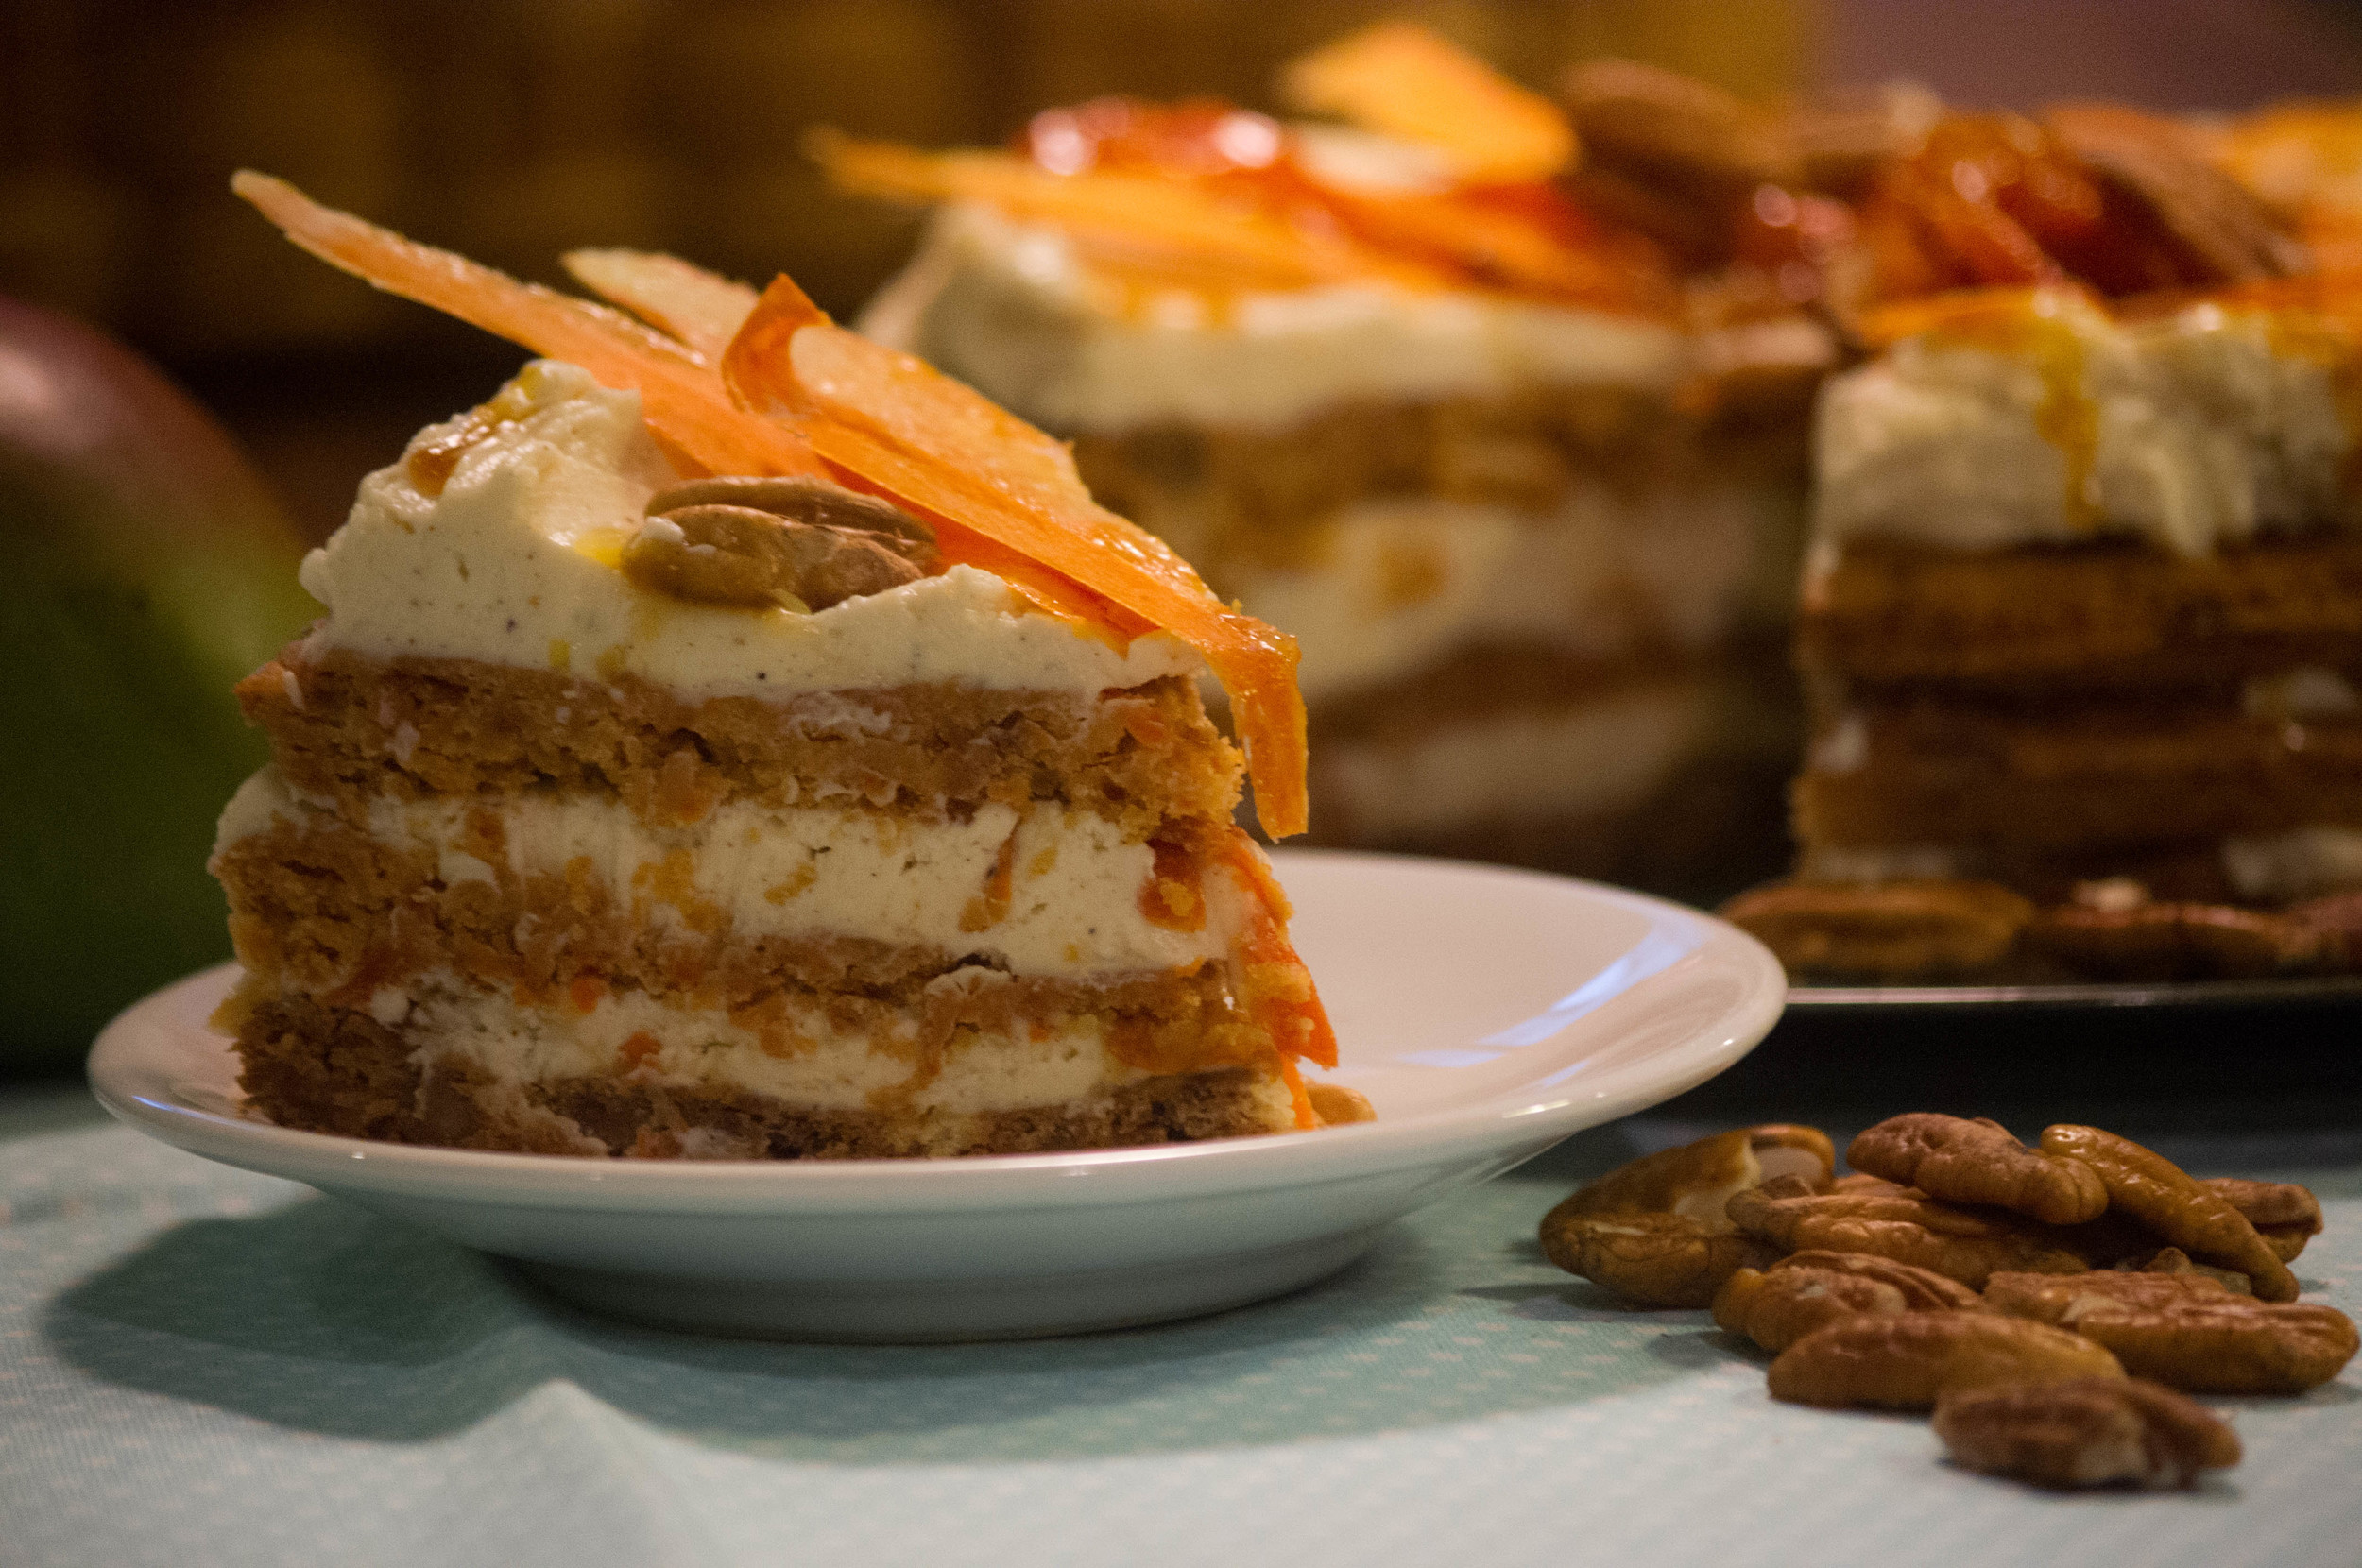 Mango carrot cake 2